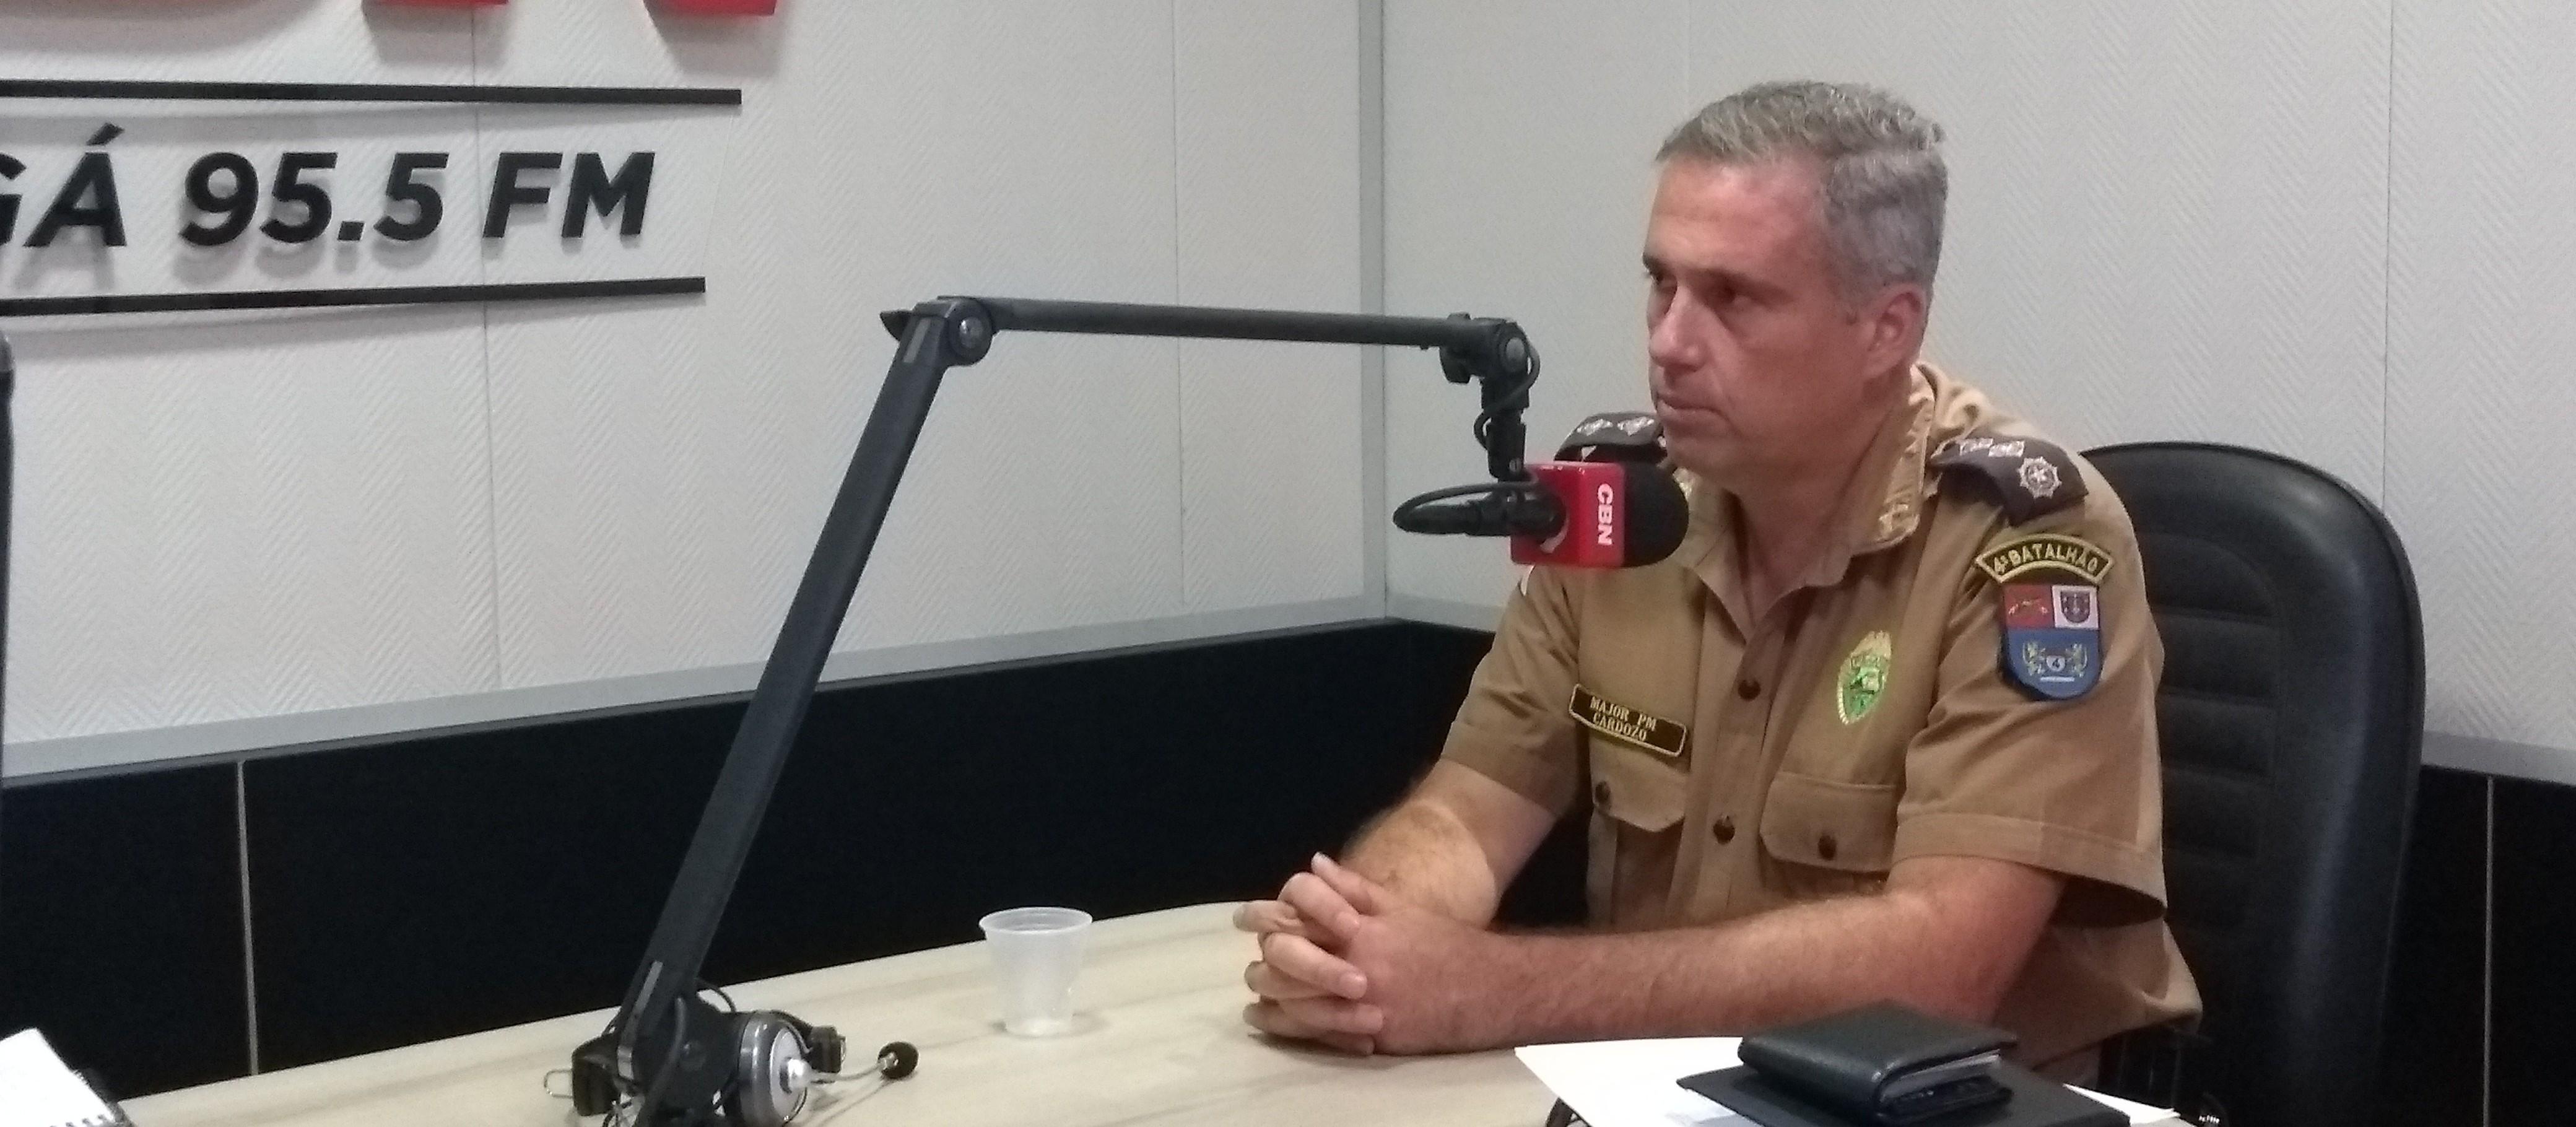 PM fará abordagens com bafômetro, em Maringá